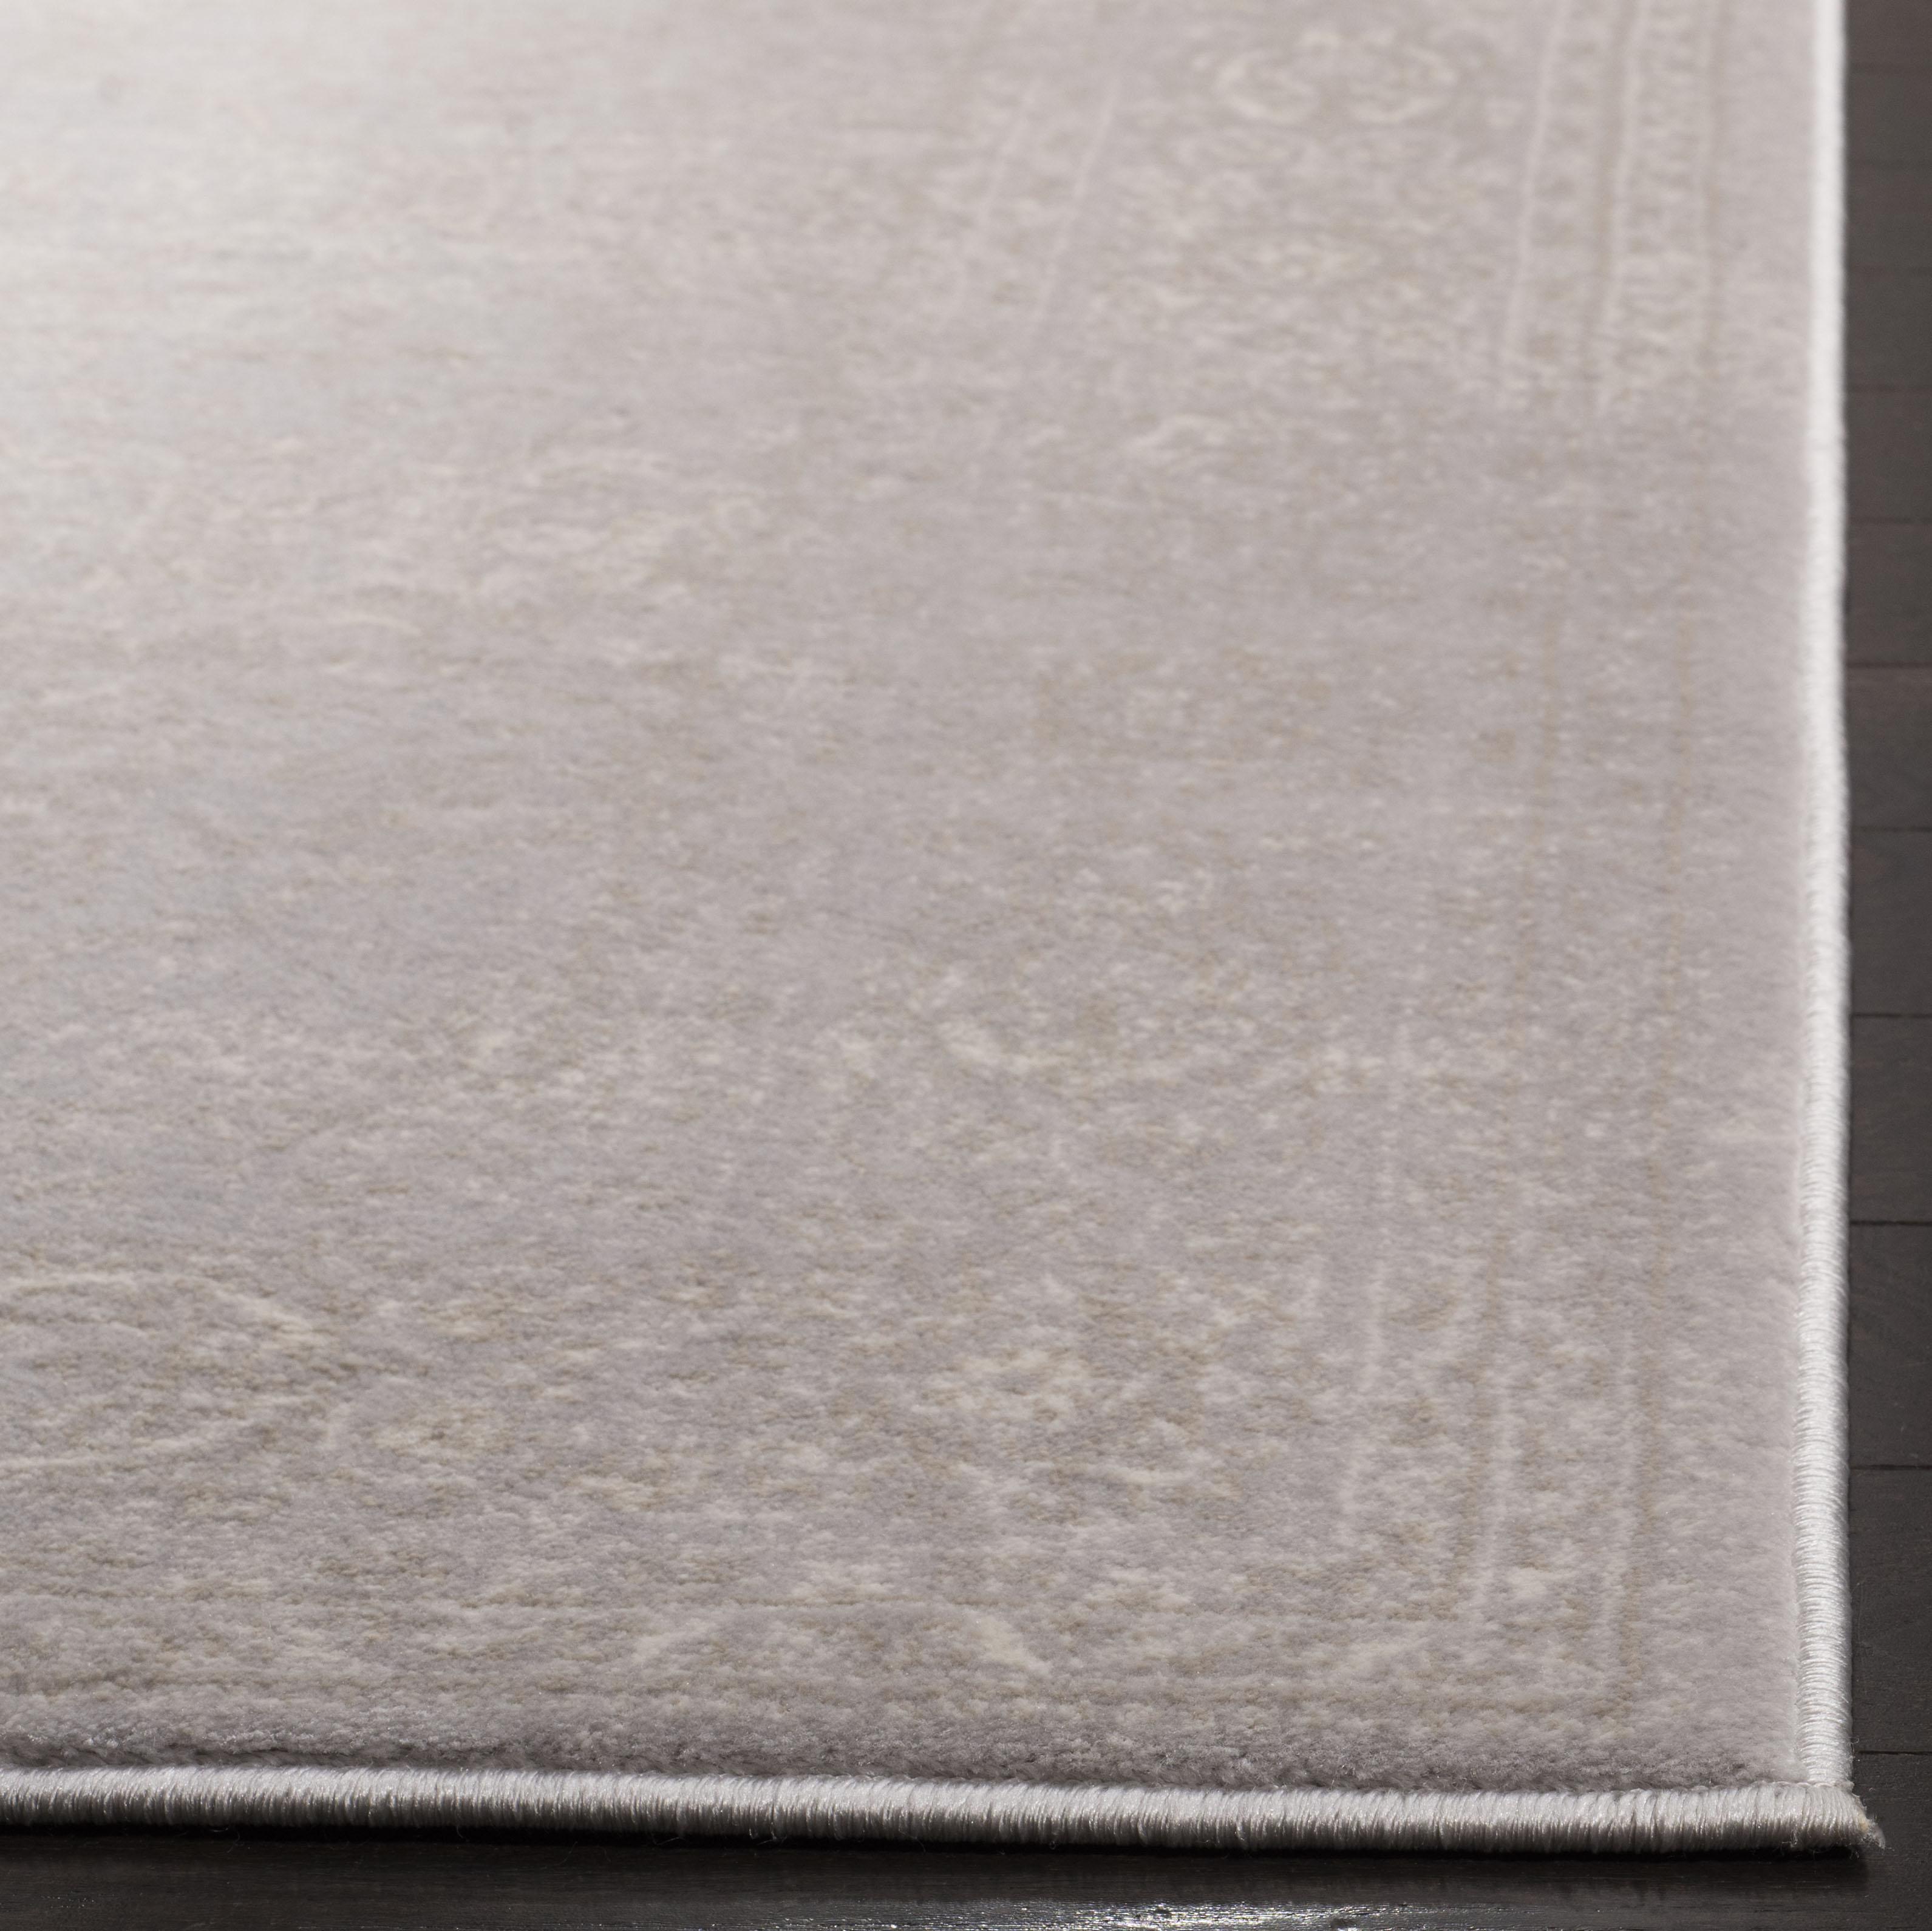 Devlin 691 8' X 10' Gray Polypropylene Rug